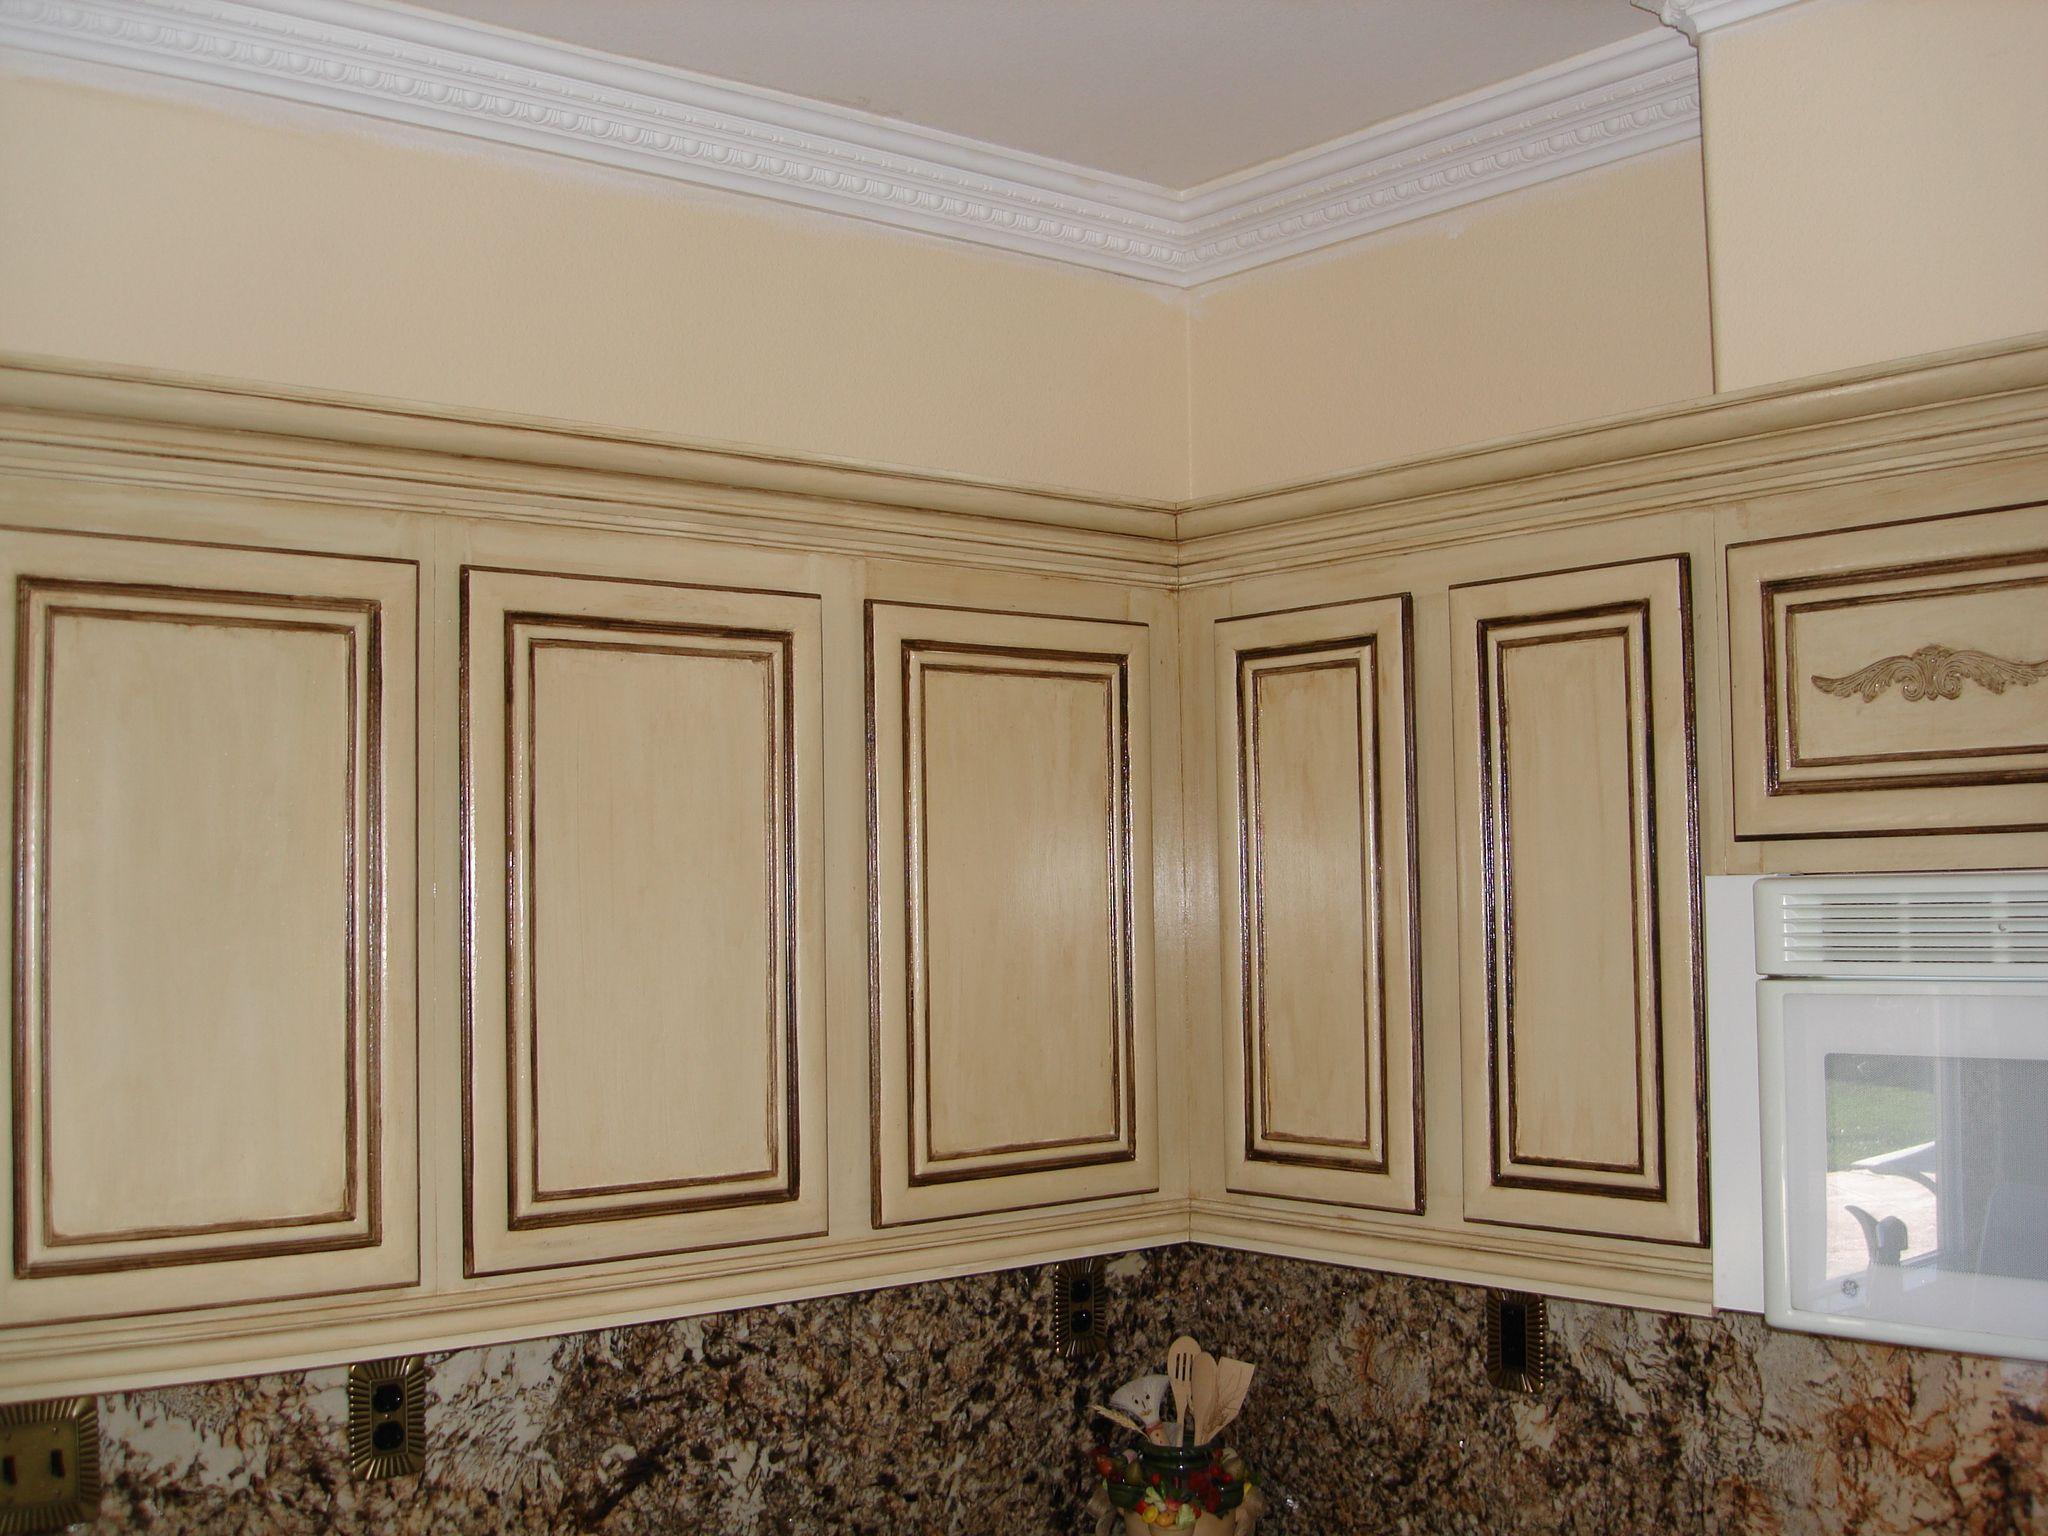 Spanish Kitchen Cabinet Home Design And Decor Reviews Kitchen Cabinets Stained Kitchen Cabinets Kitchen Cabinet Remodel